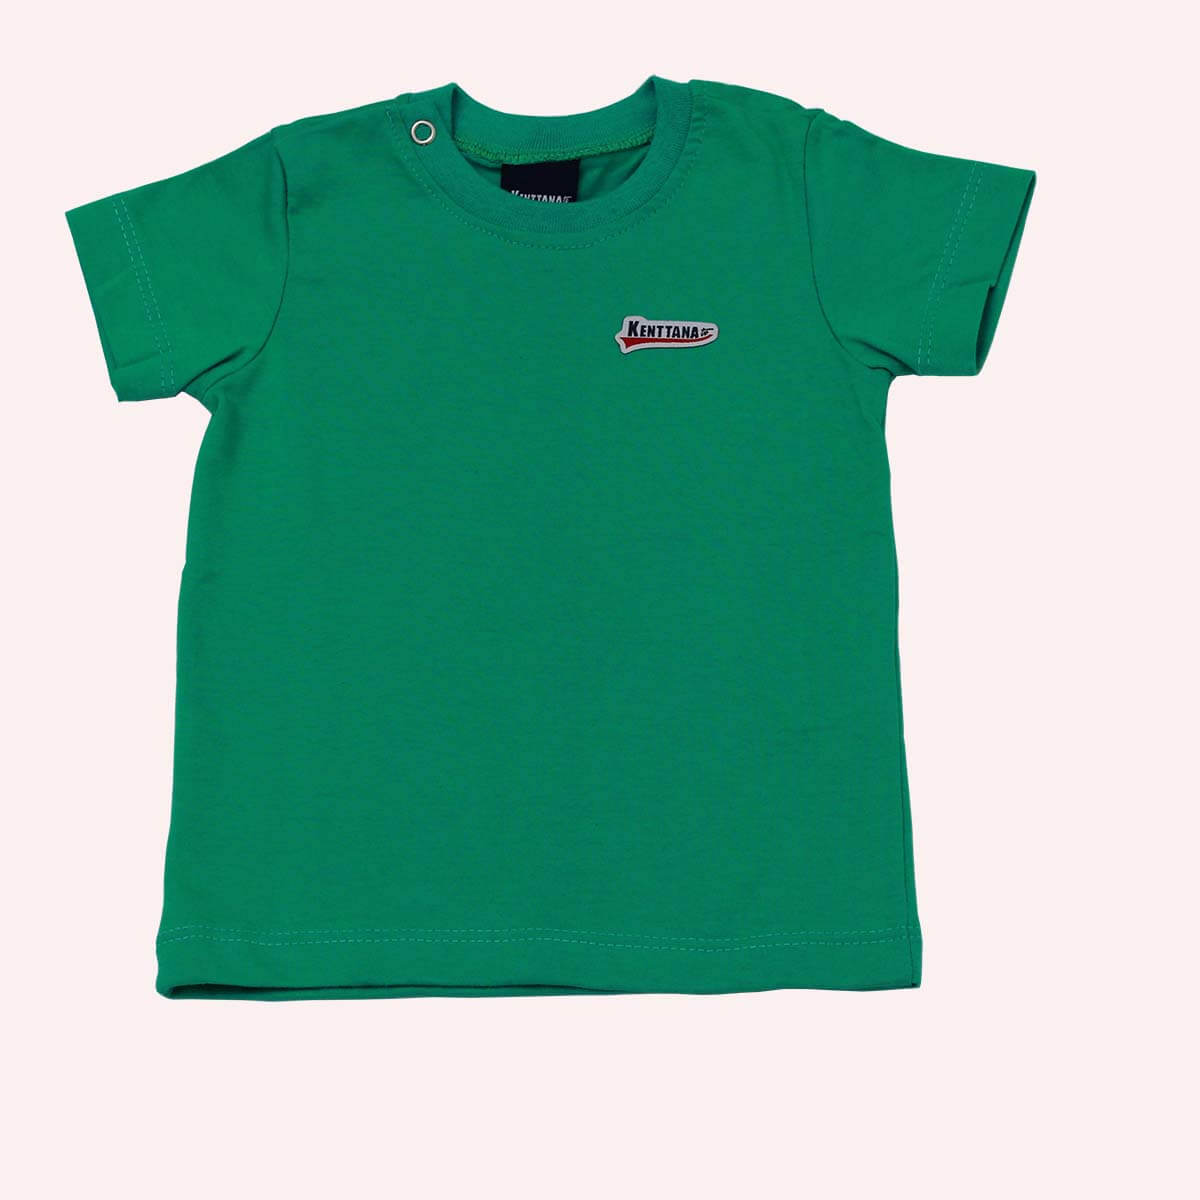 Camiseta Kenttana Verde Baby